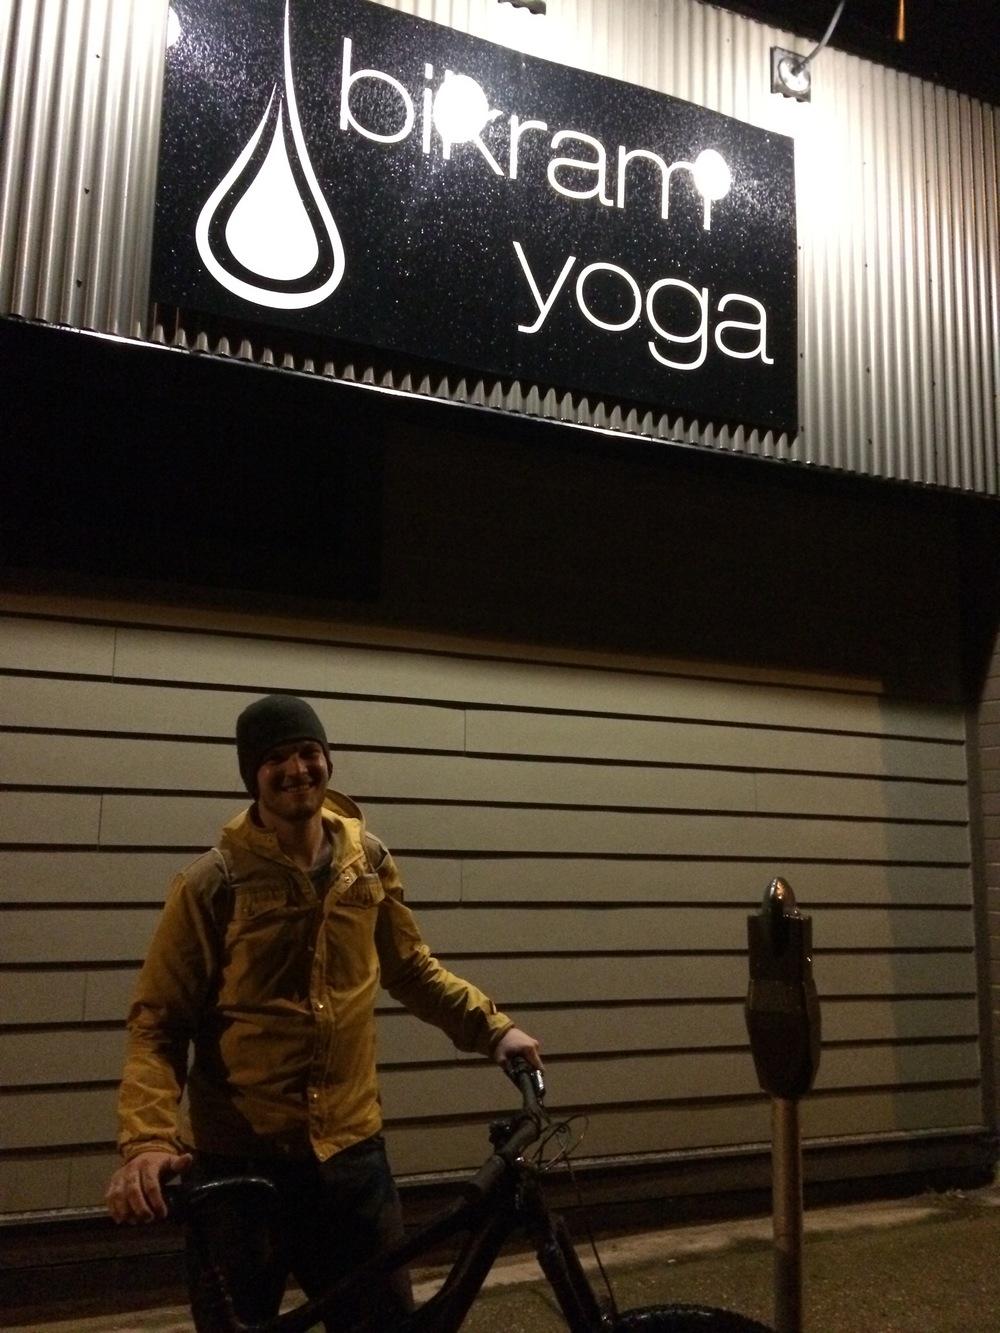 bikram yoga vernon - nomad yoga family